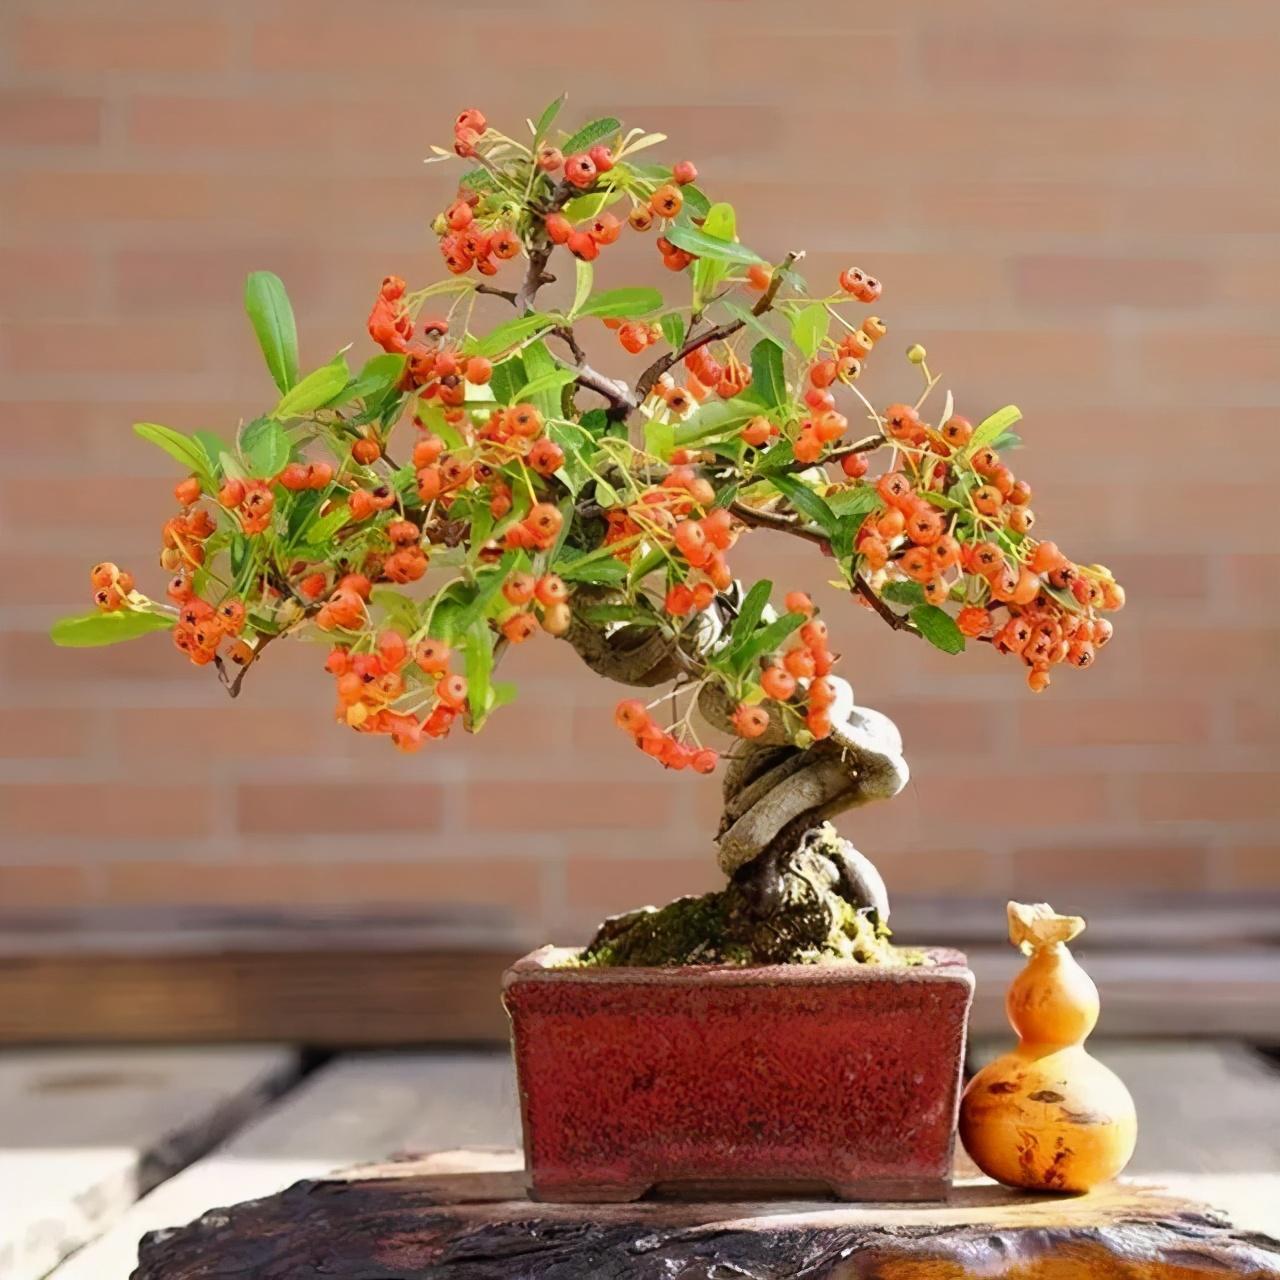 �G植�B�o中�^花植物�c�^果植物的�x�衽c��用――武�h�G��@林